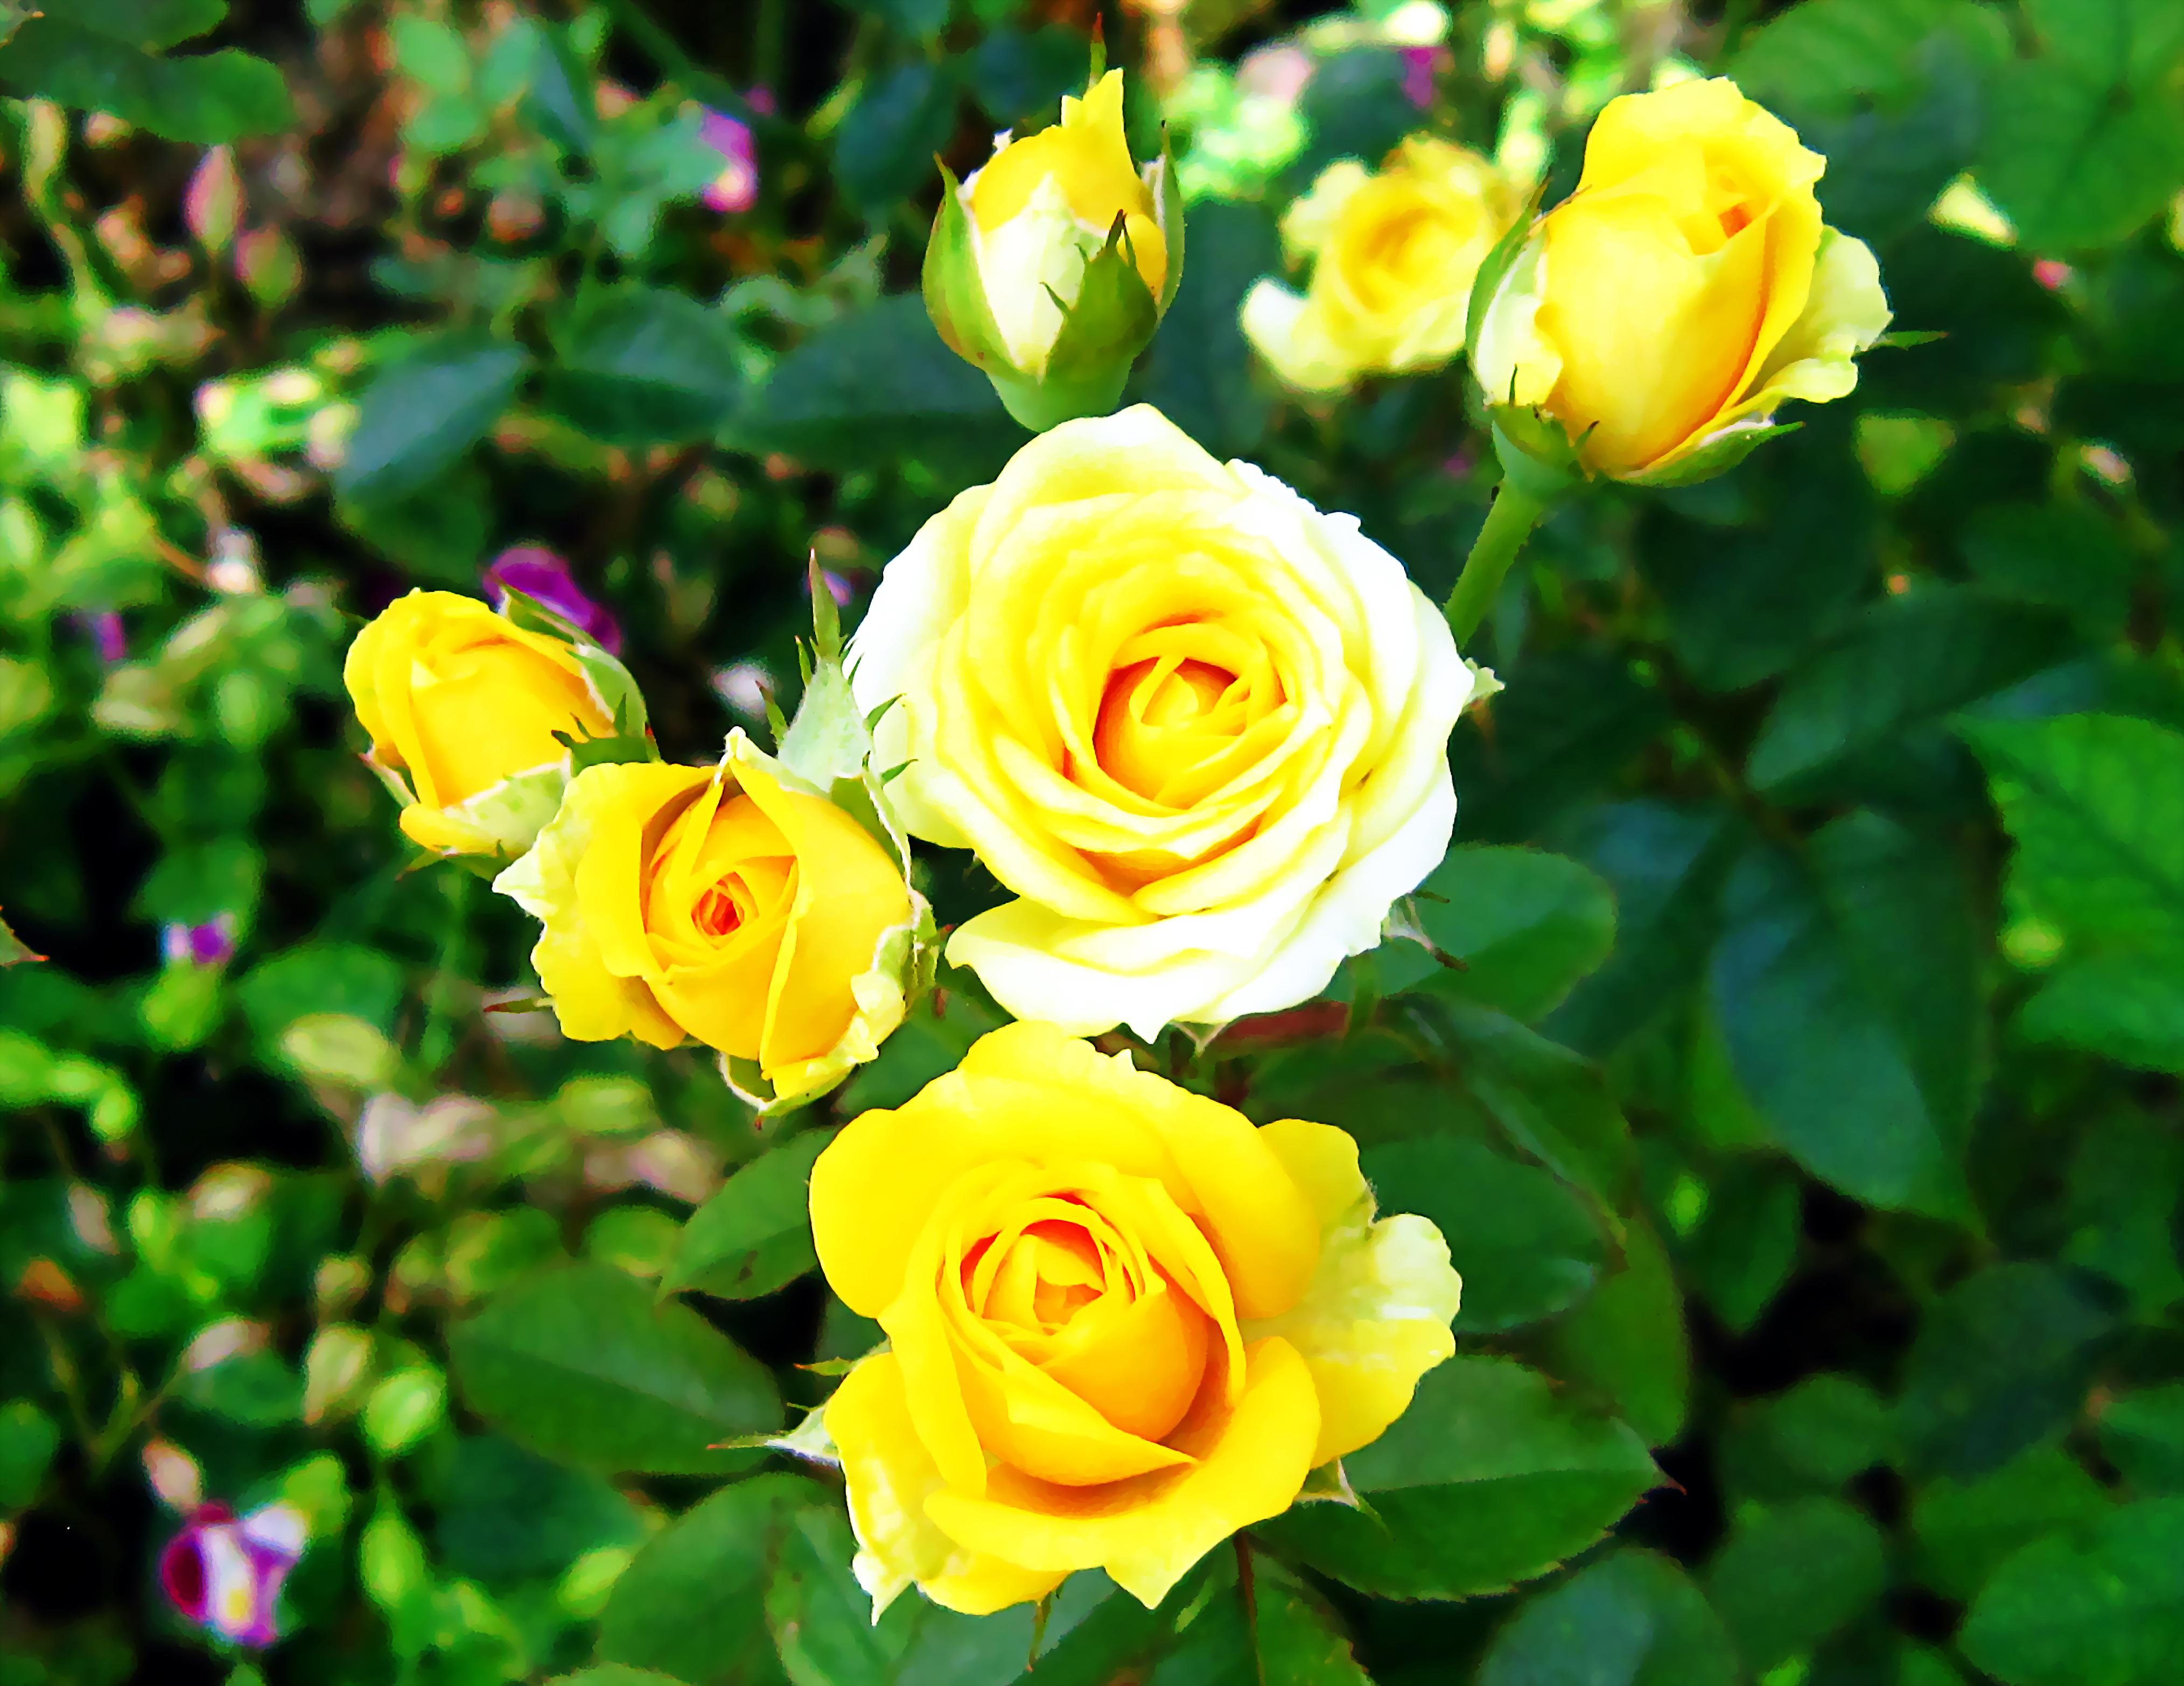 File:Hoa hồng vàng.jpg - Wikimedia Commons